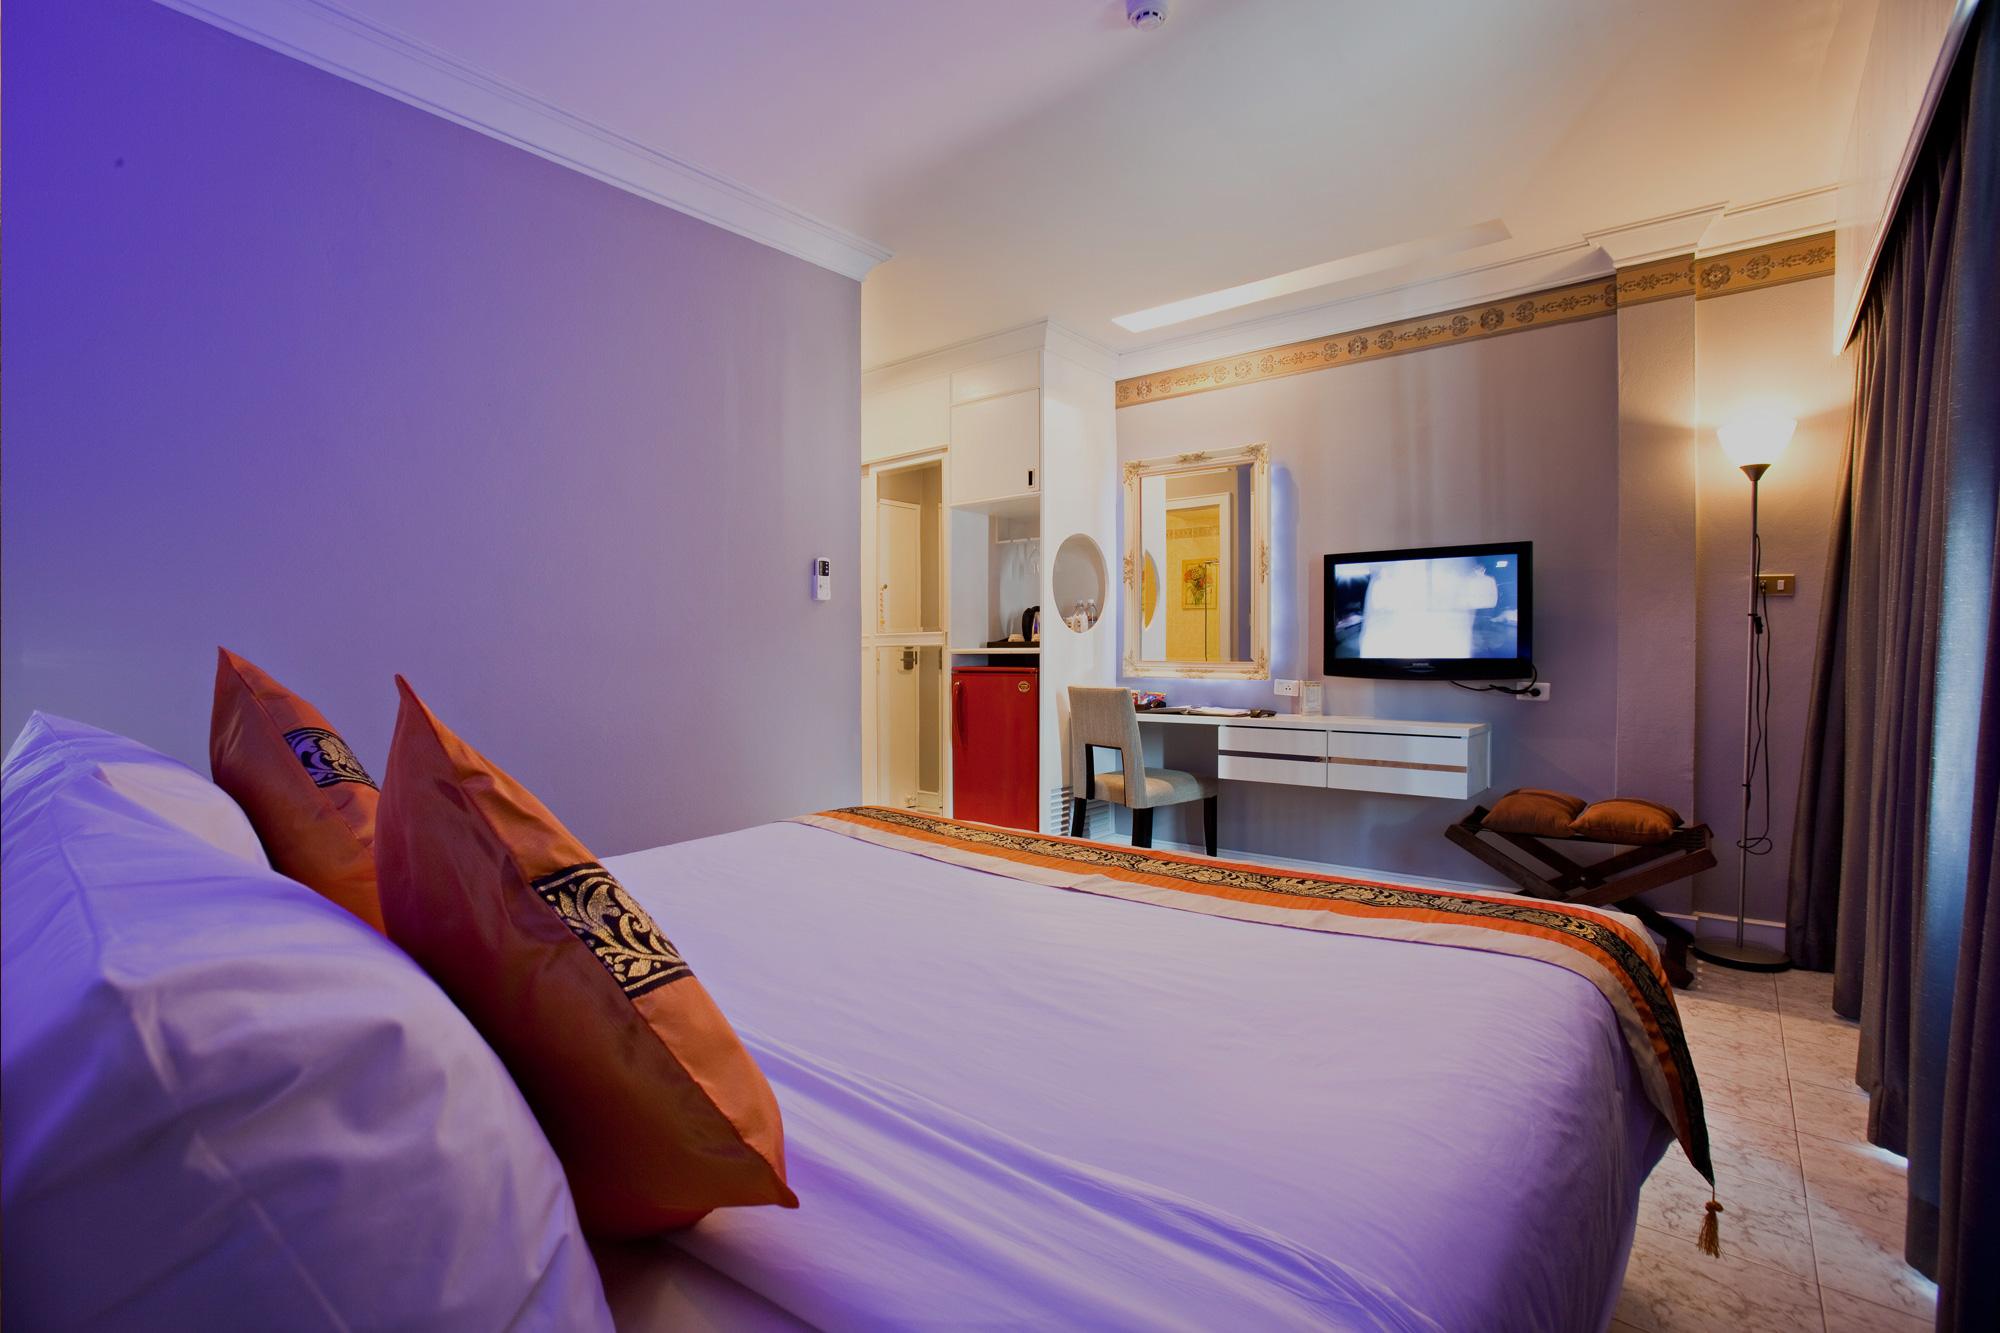 C N Hotel Patong Patong Beach City Hotels Accommodation Phuket Thailand